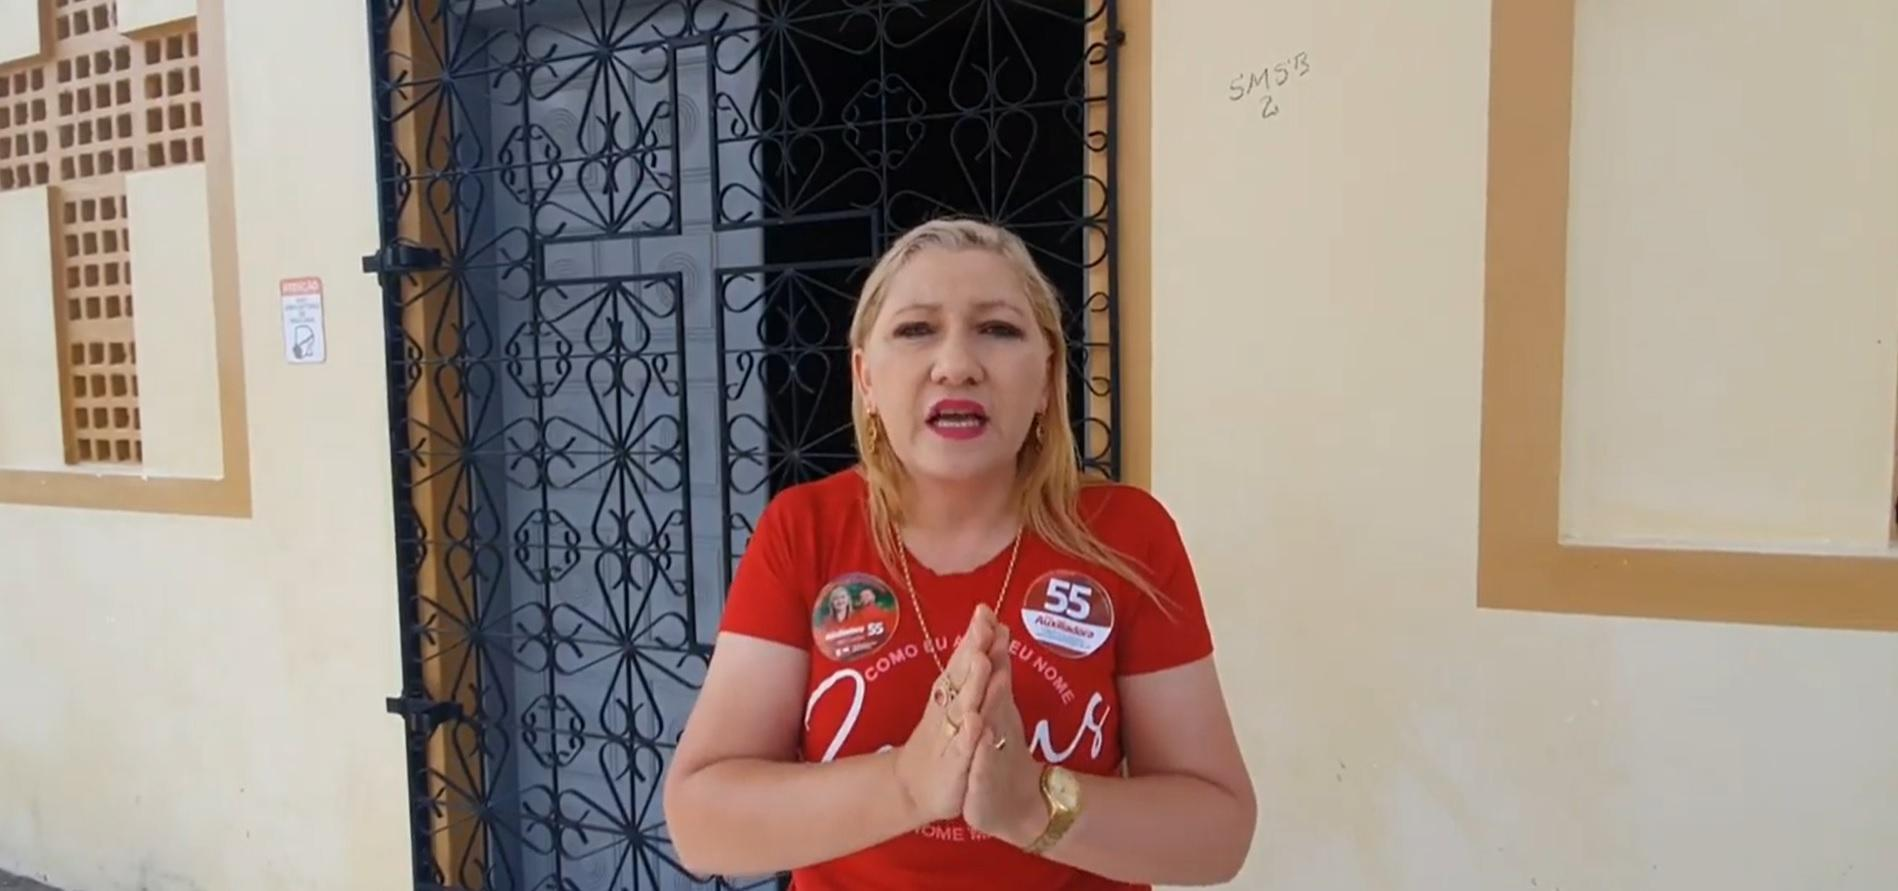 Prefeita eleita de Barreira, Dra. Auxiliadora